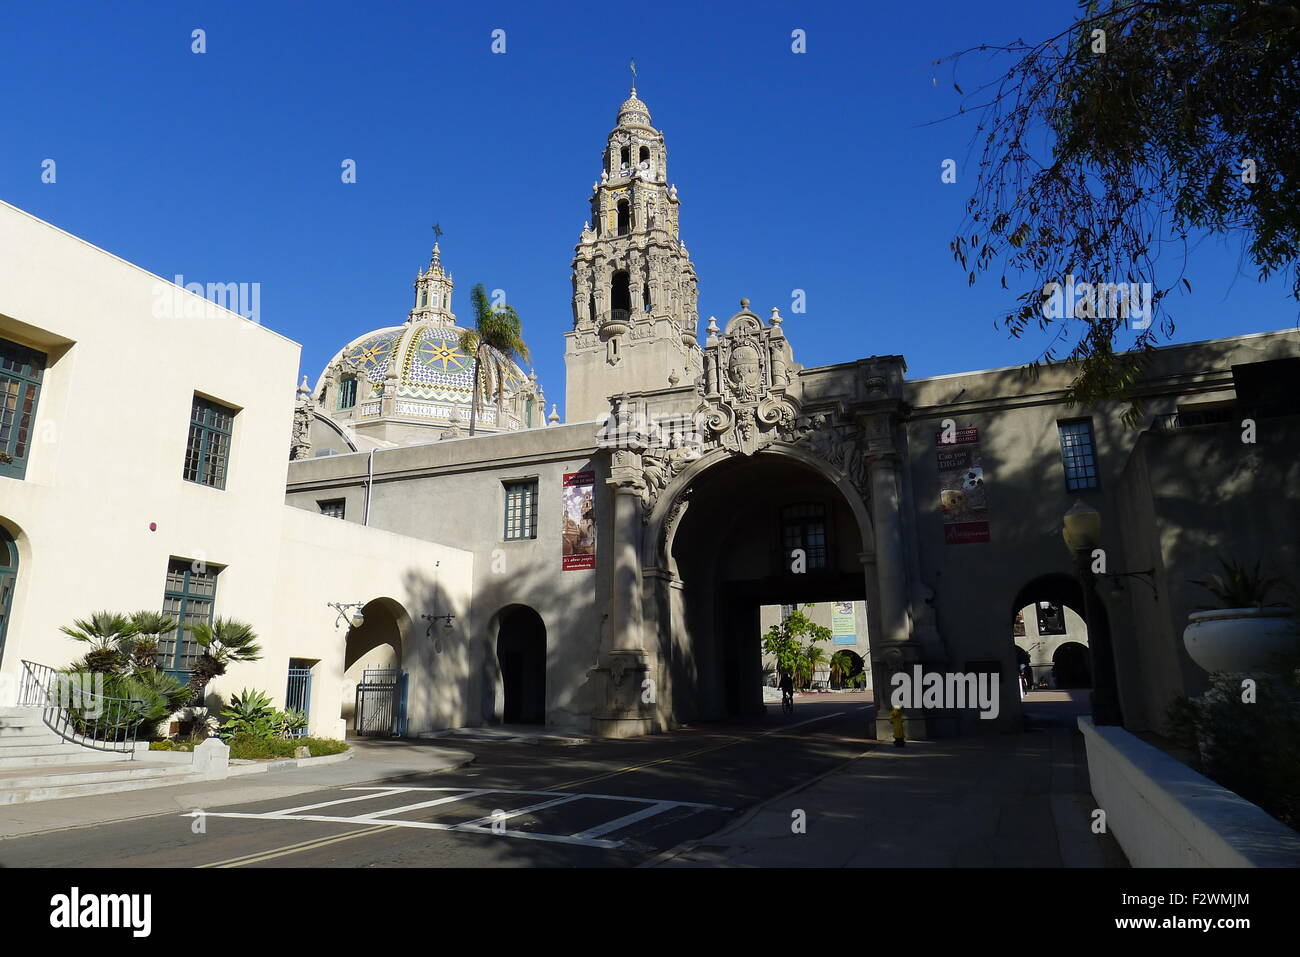 Entrance to the Plaza de California - California Quadrangle - Balboa Park - San Diego - Stock Image